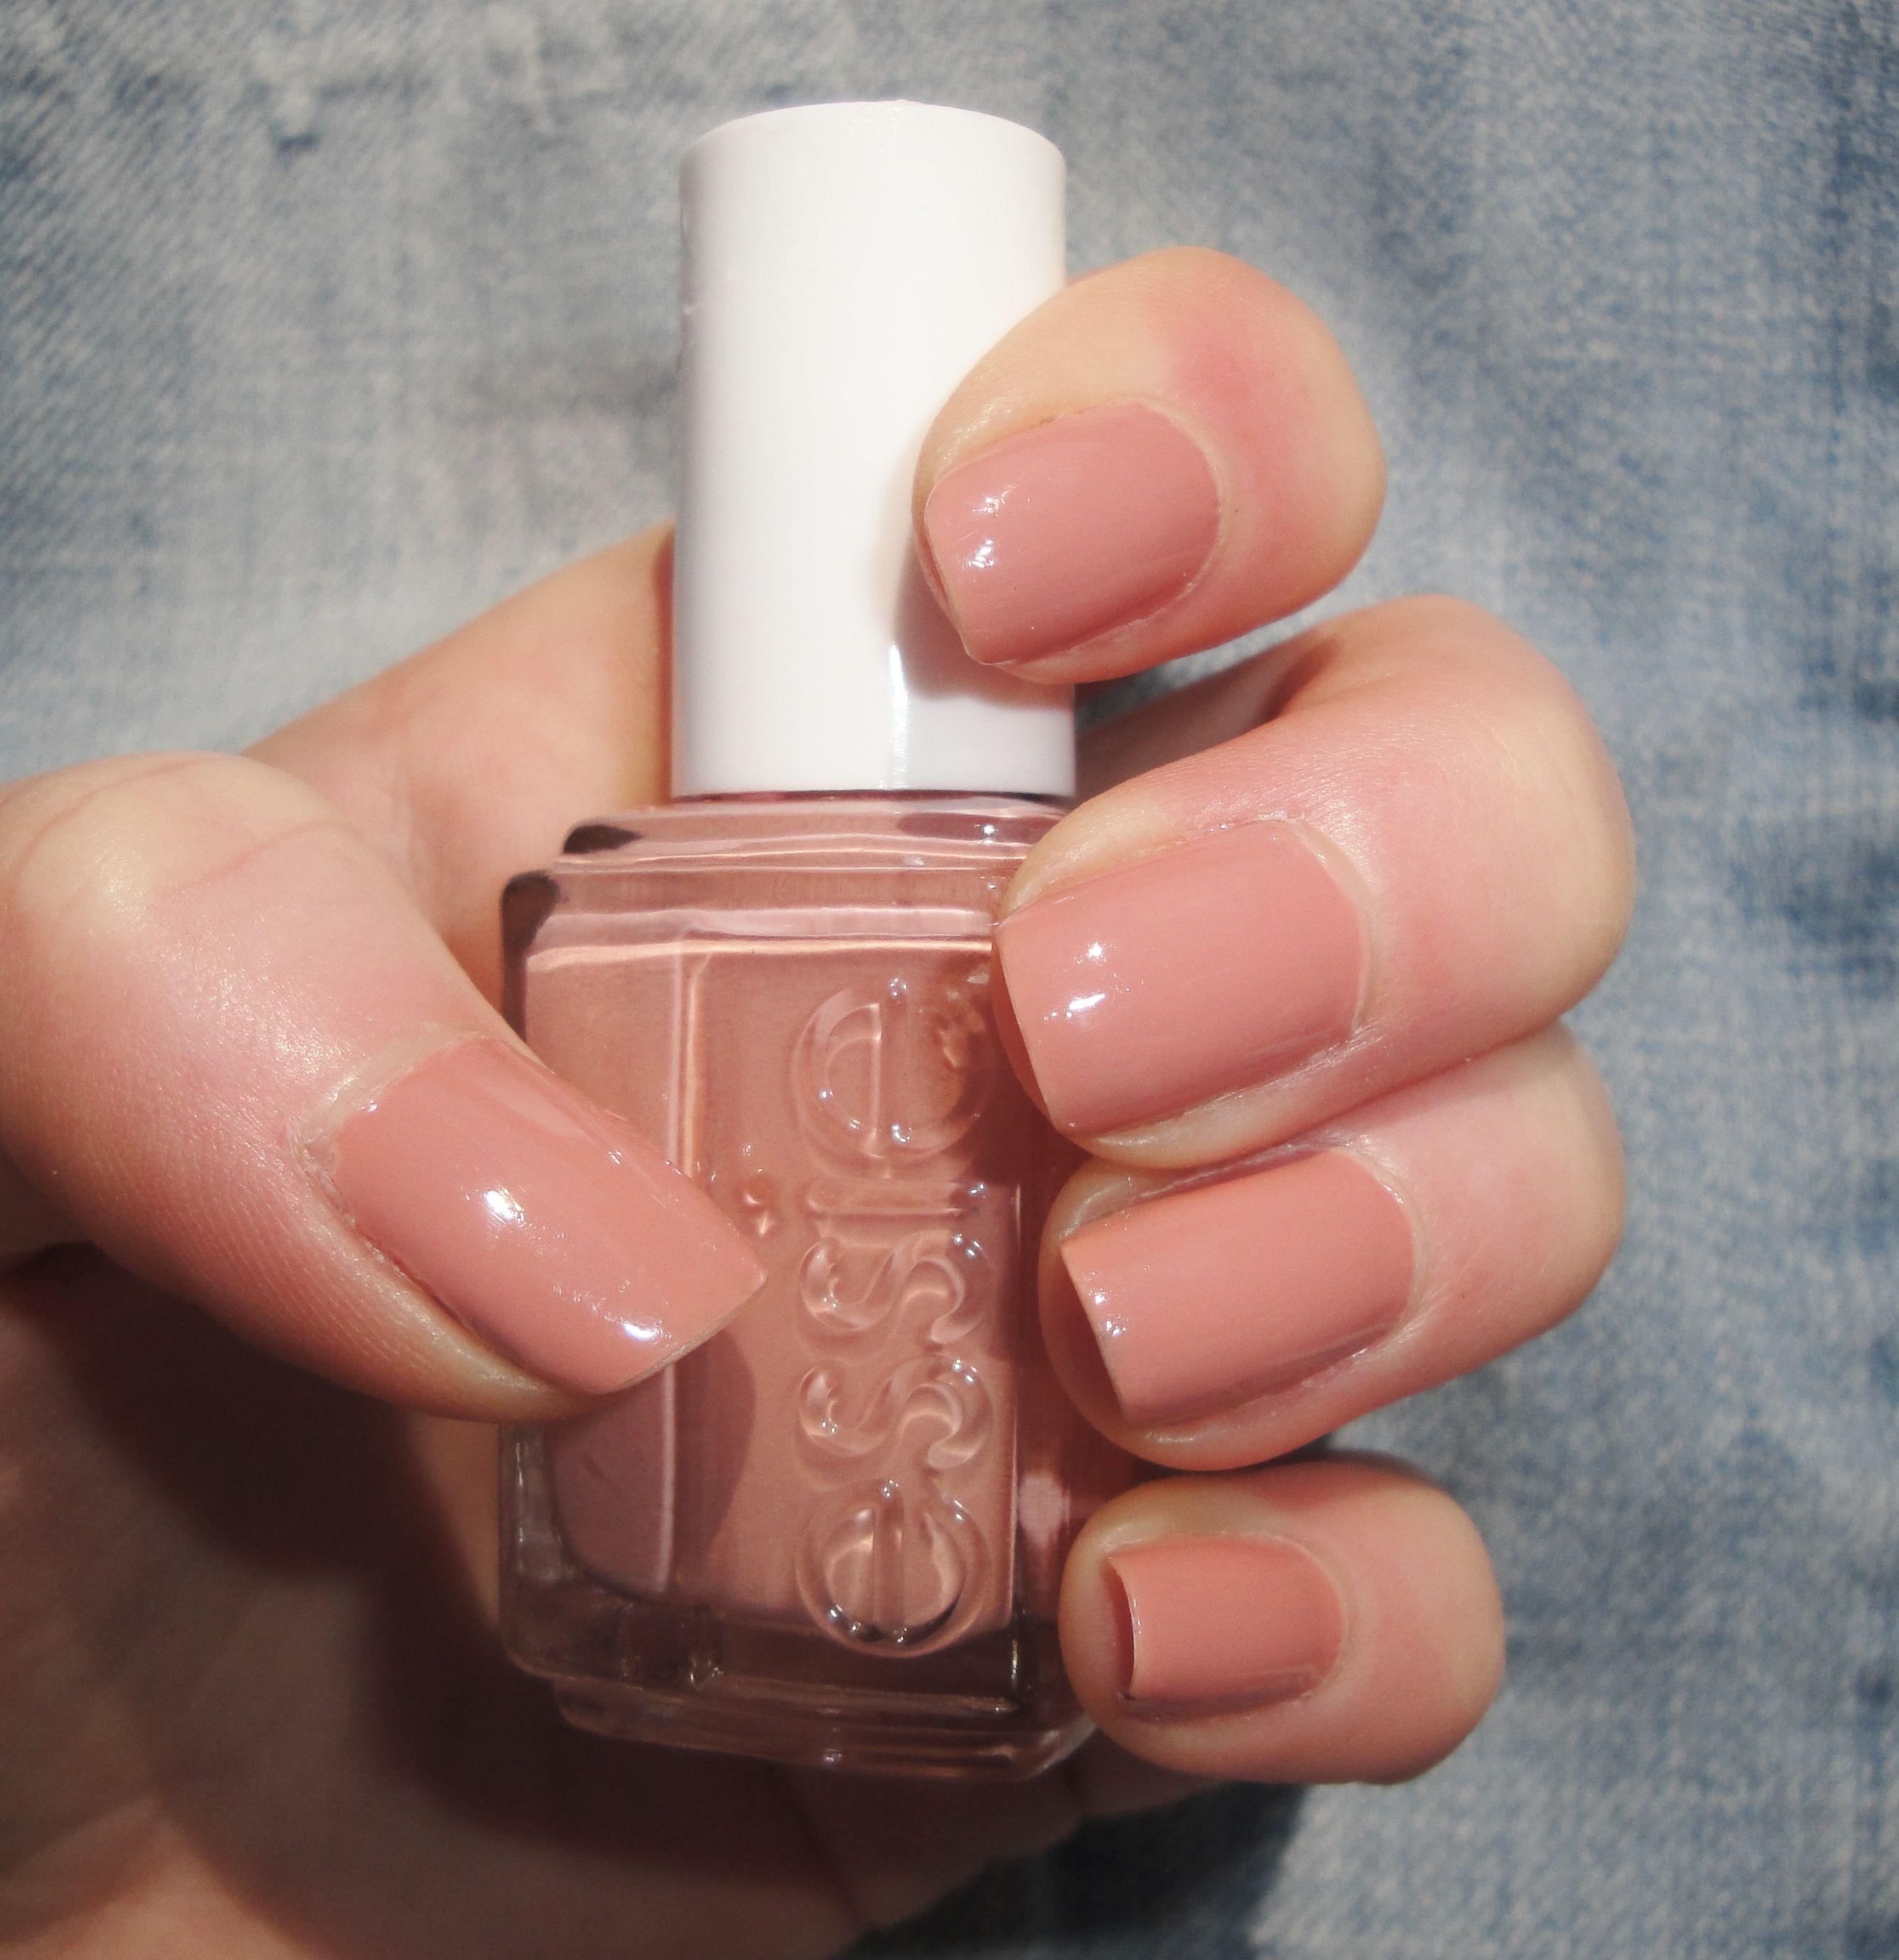 Essie - Eternal Optimist. Dusty nude pink nail polish. (my go-to ...